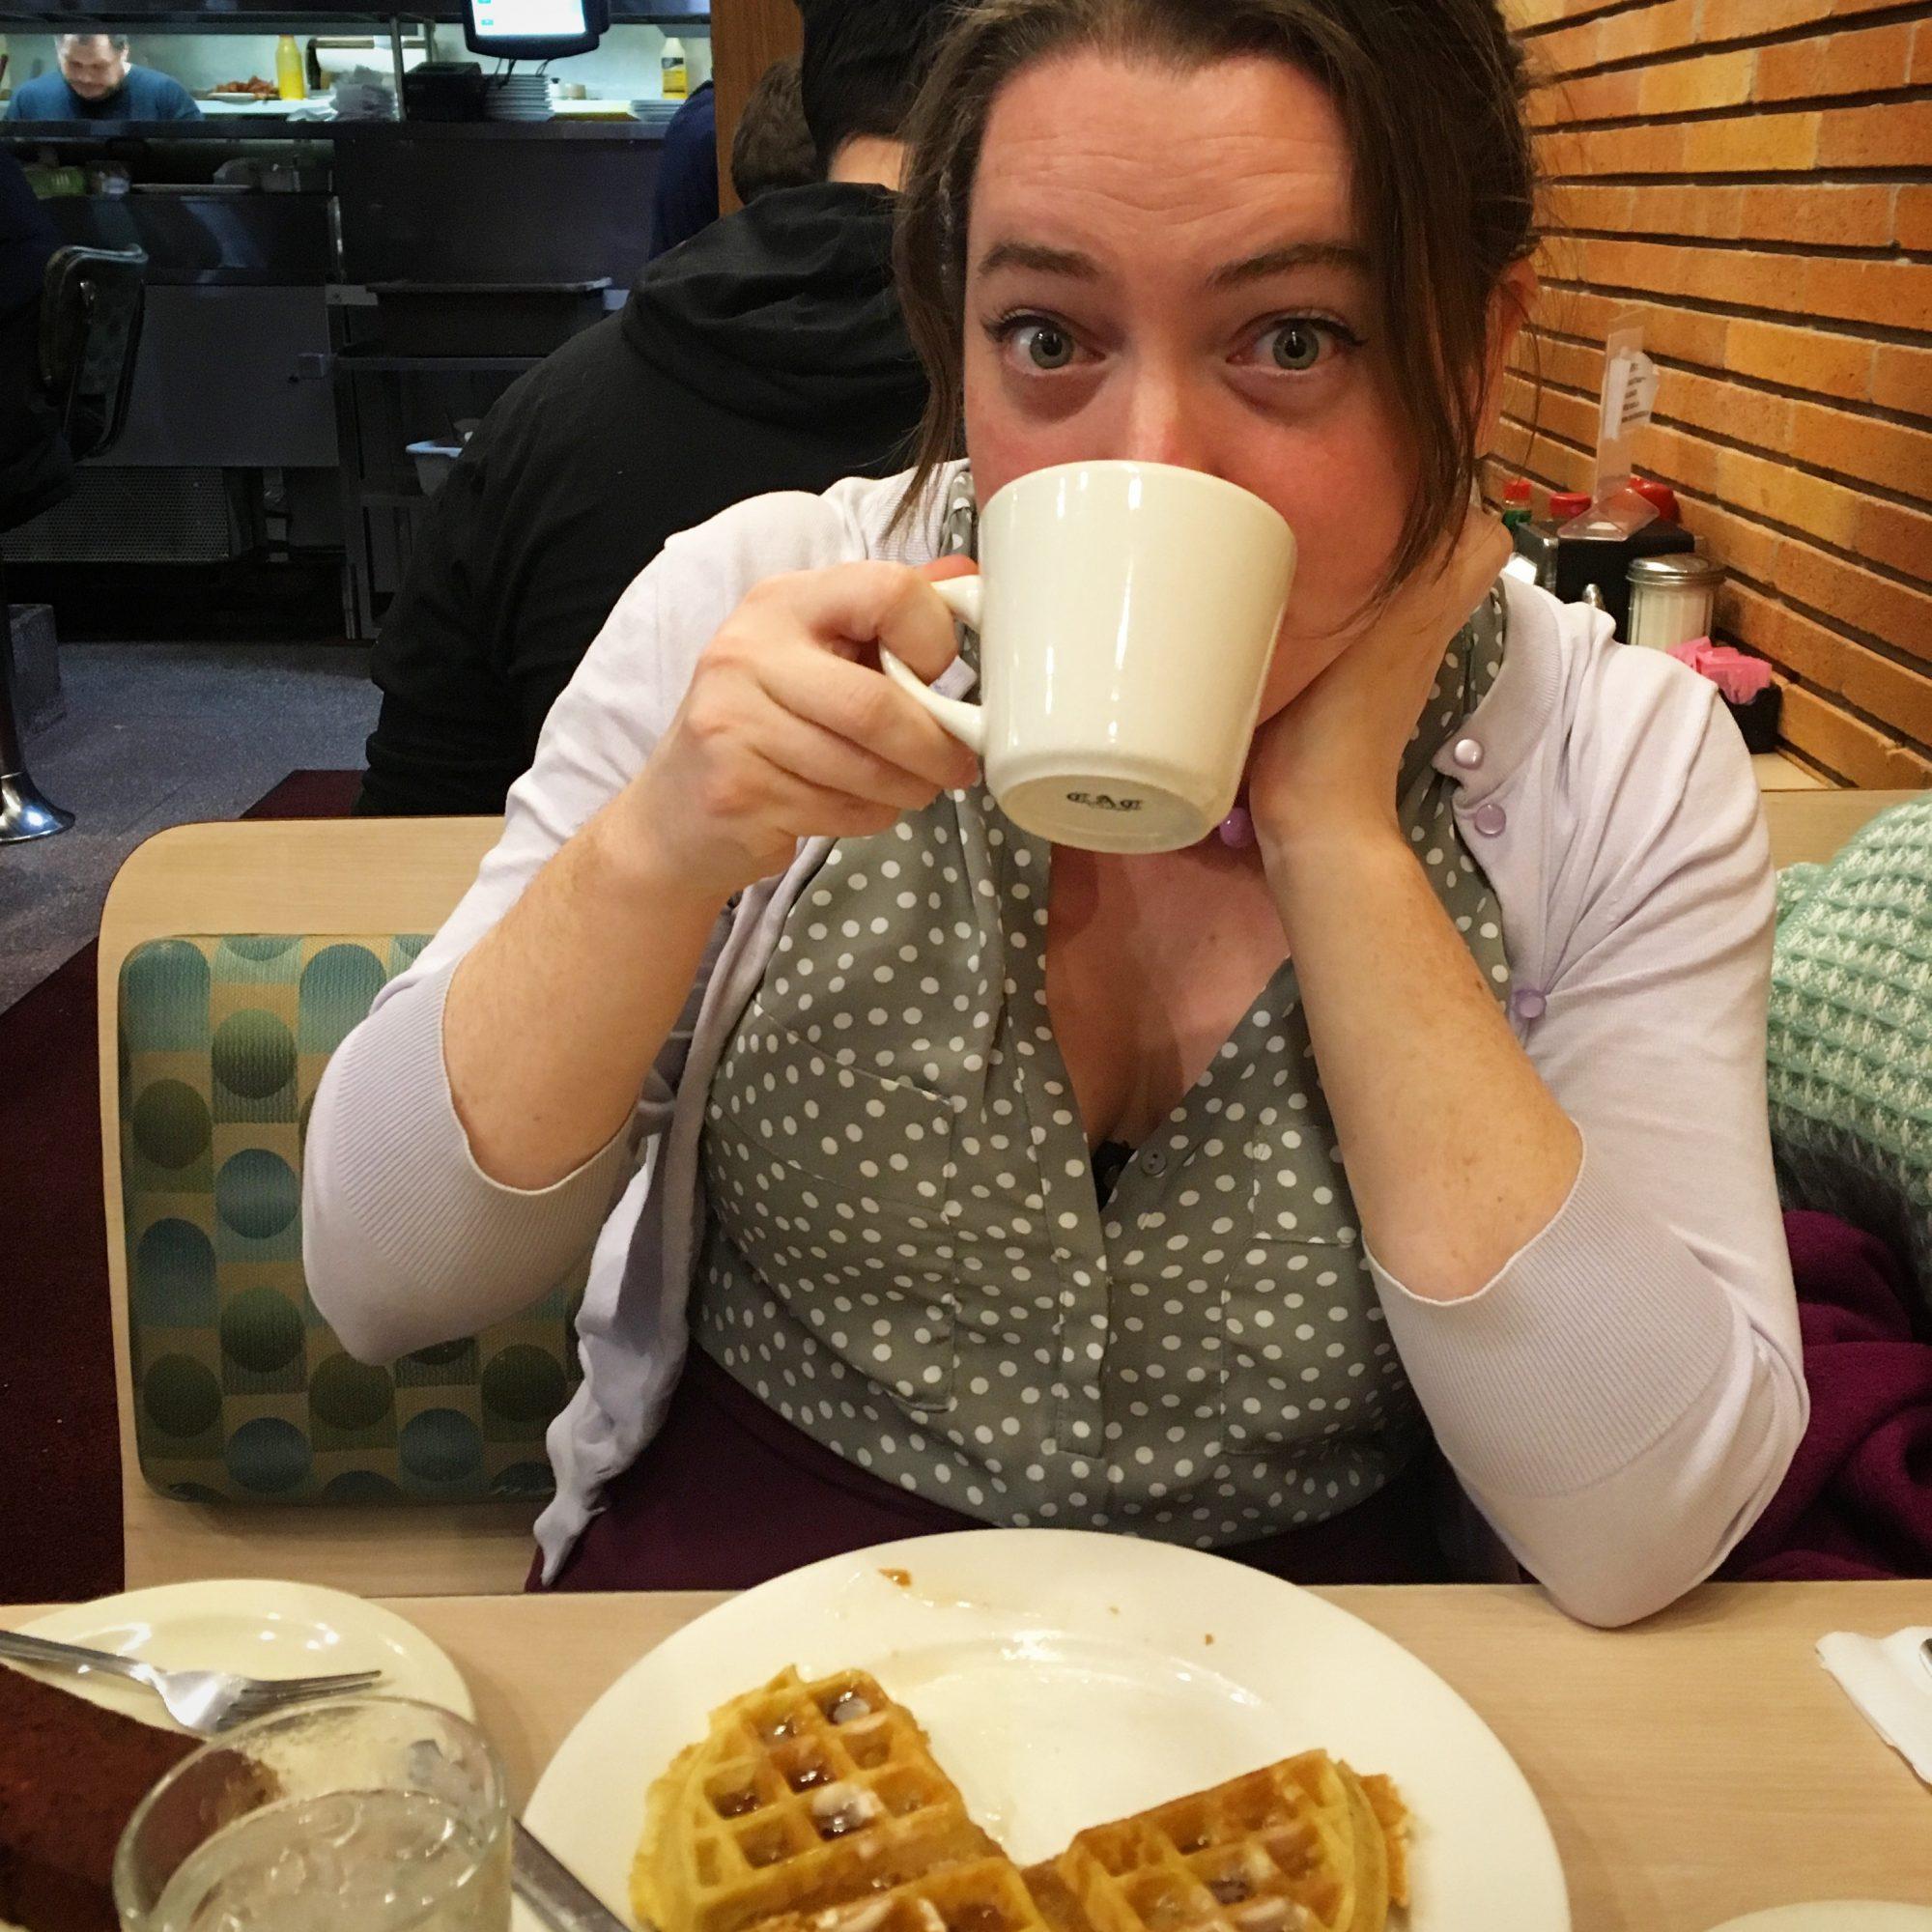 EC: How Margaret H. Willison, the Internet's Favorite Librarian, Does Breakfast